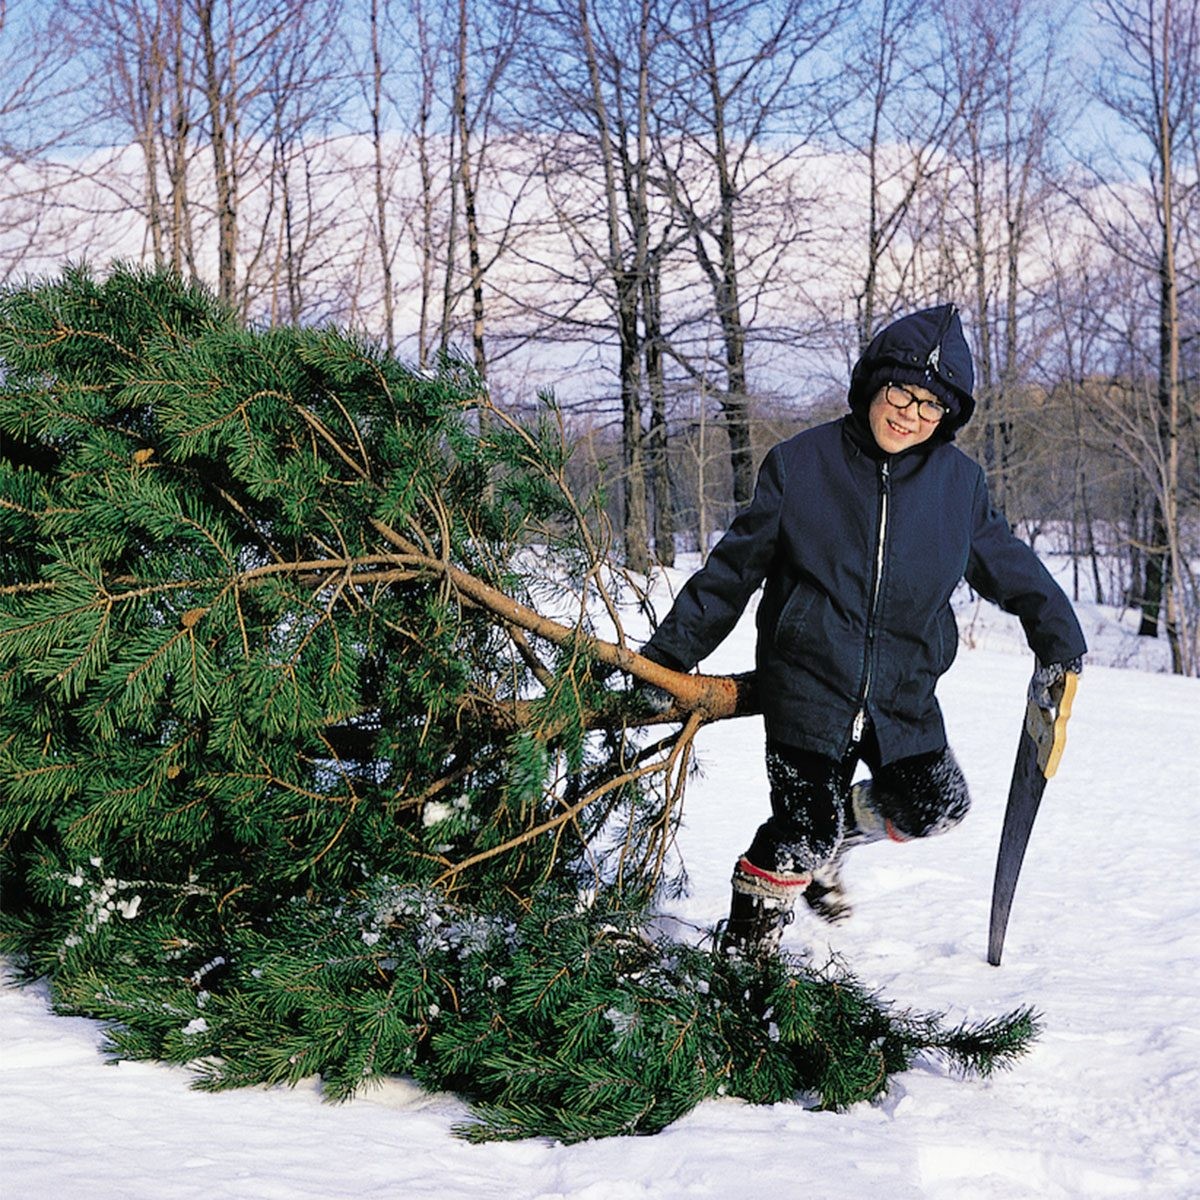 Boy dragging a tree he chopped down